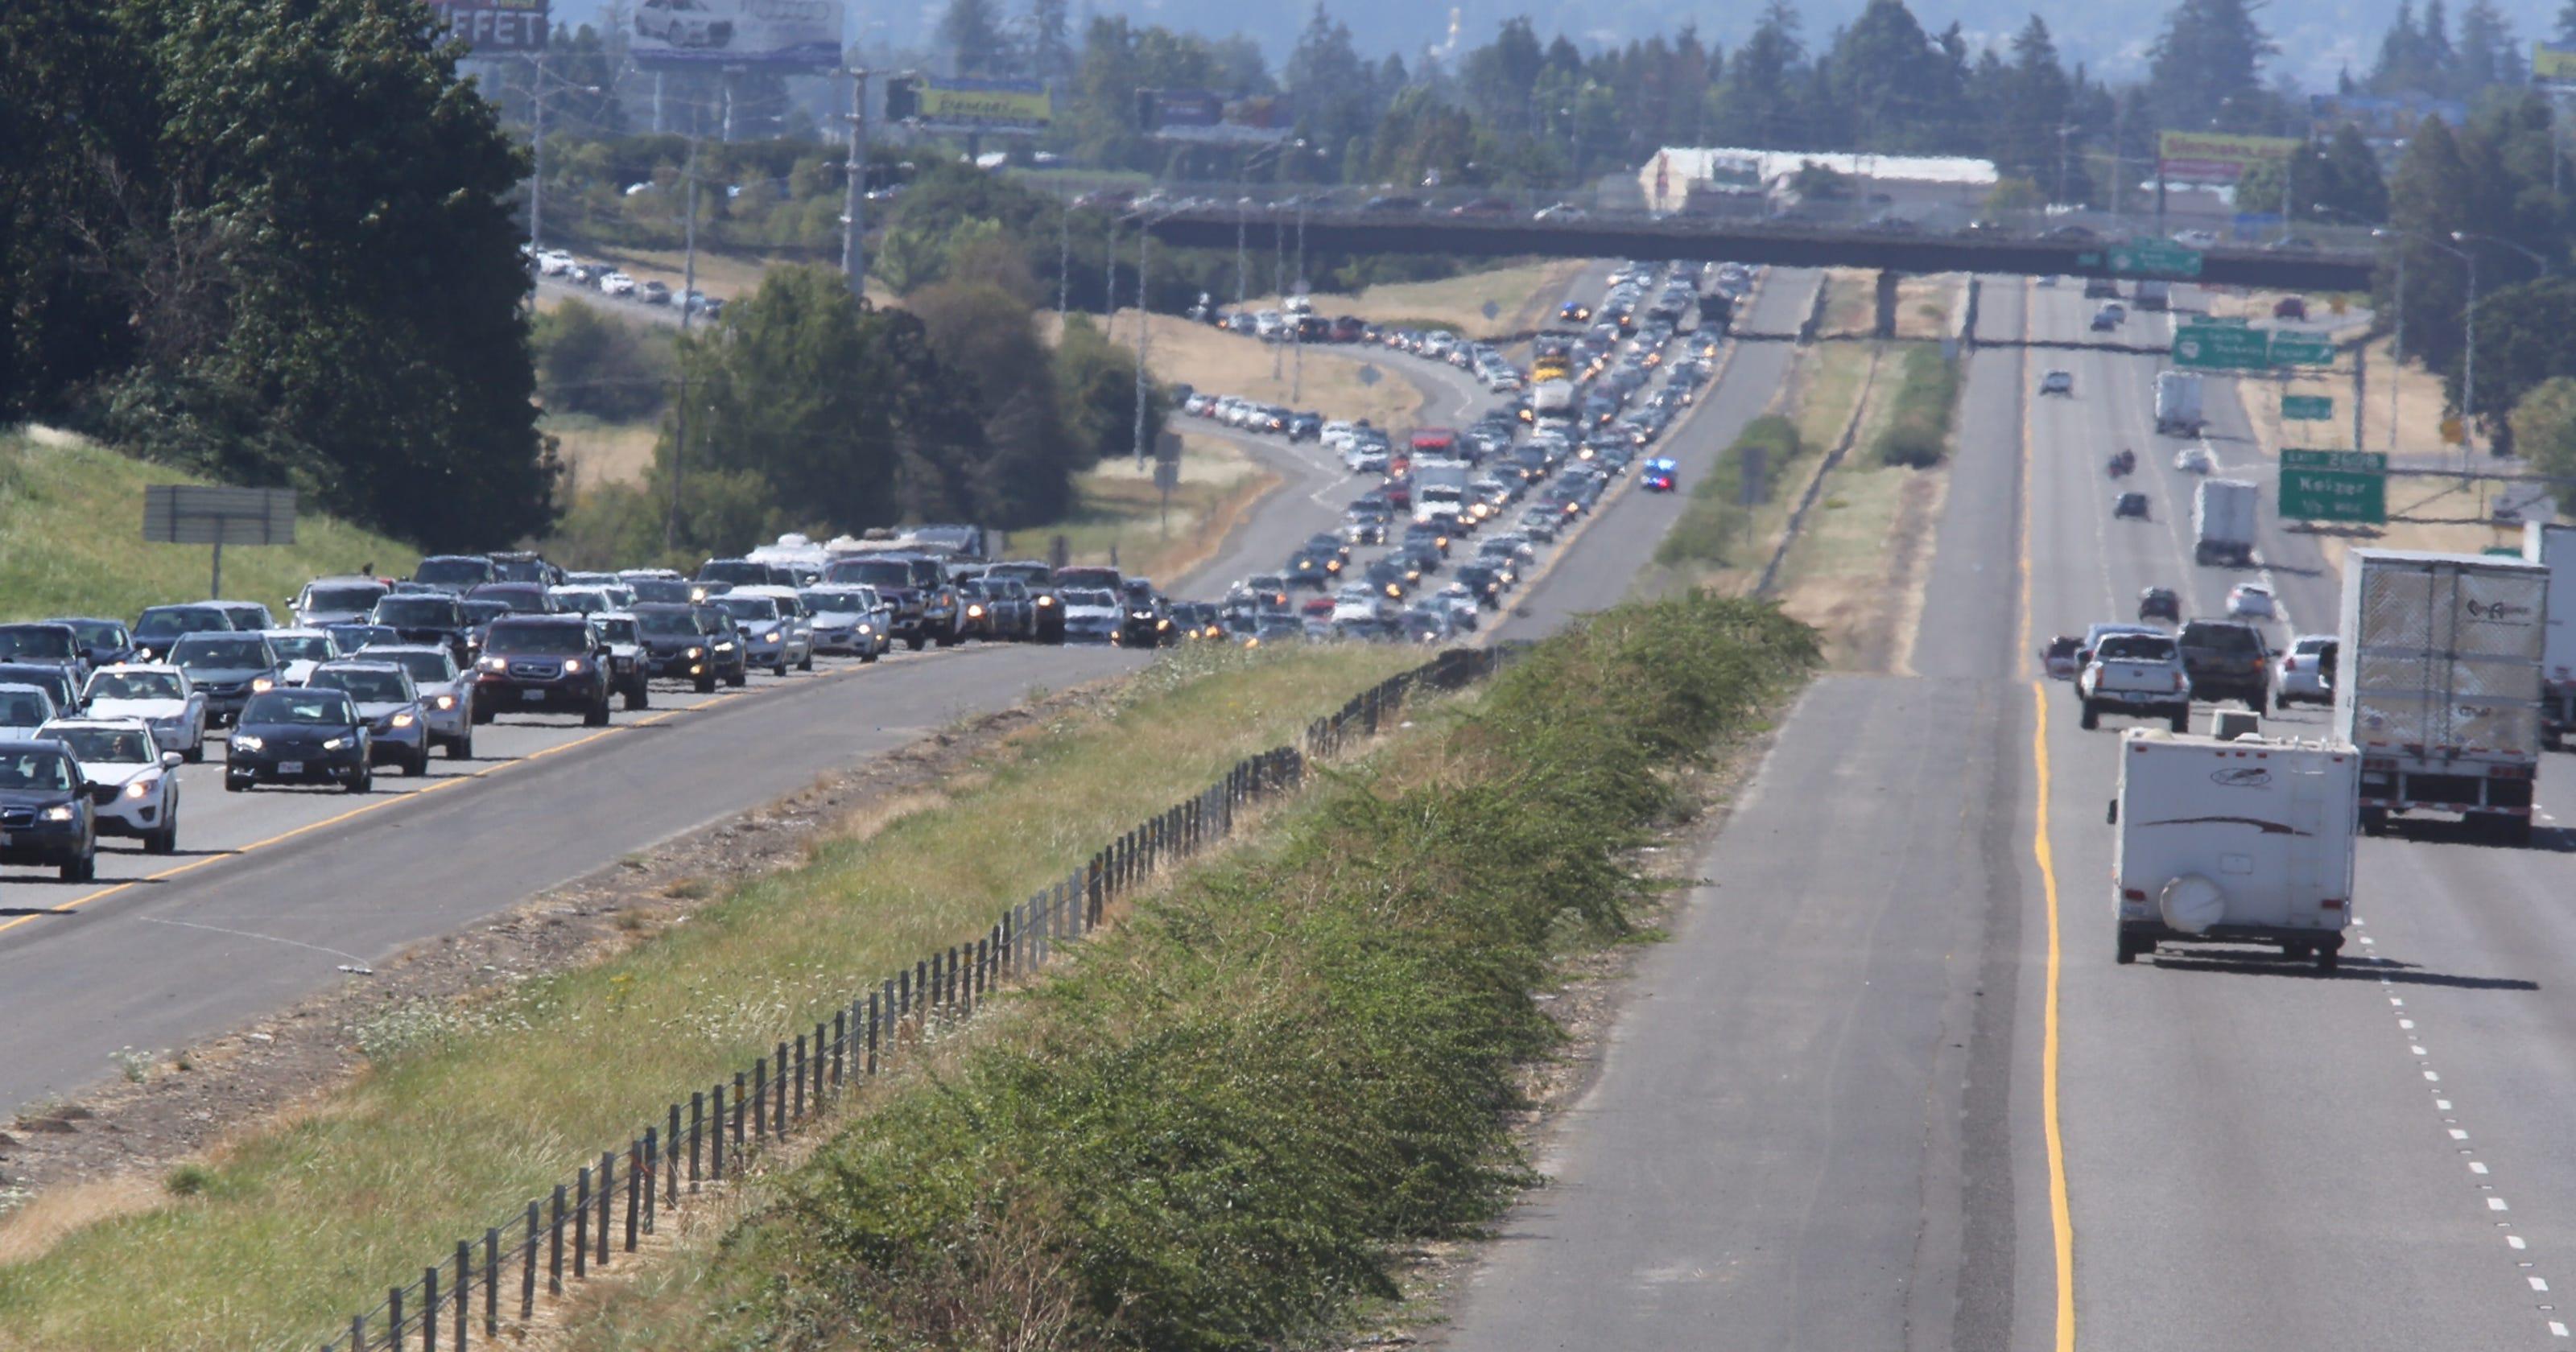 Solar Eclipse 2017 Highway Traffic Map.Salem Oregon Traffic Update After The Total Solar Eclipse